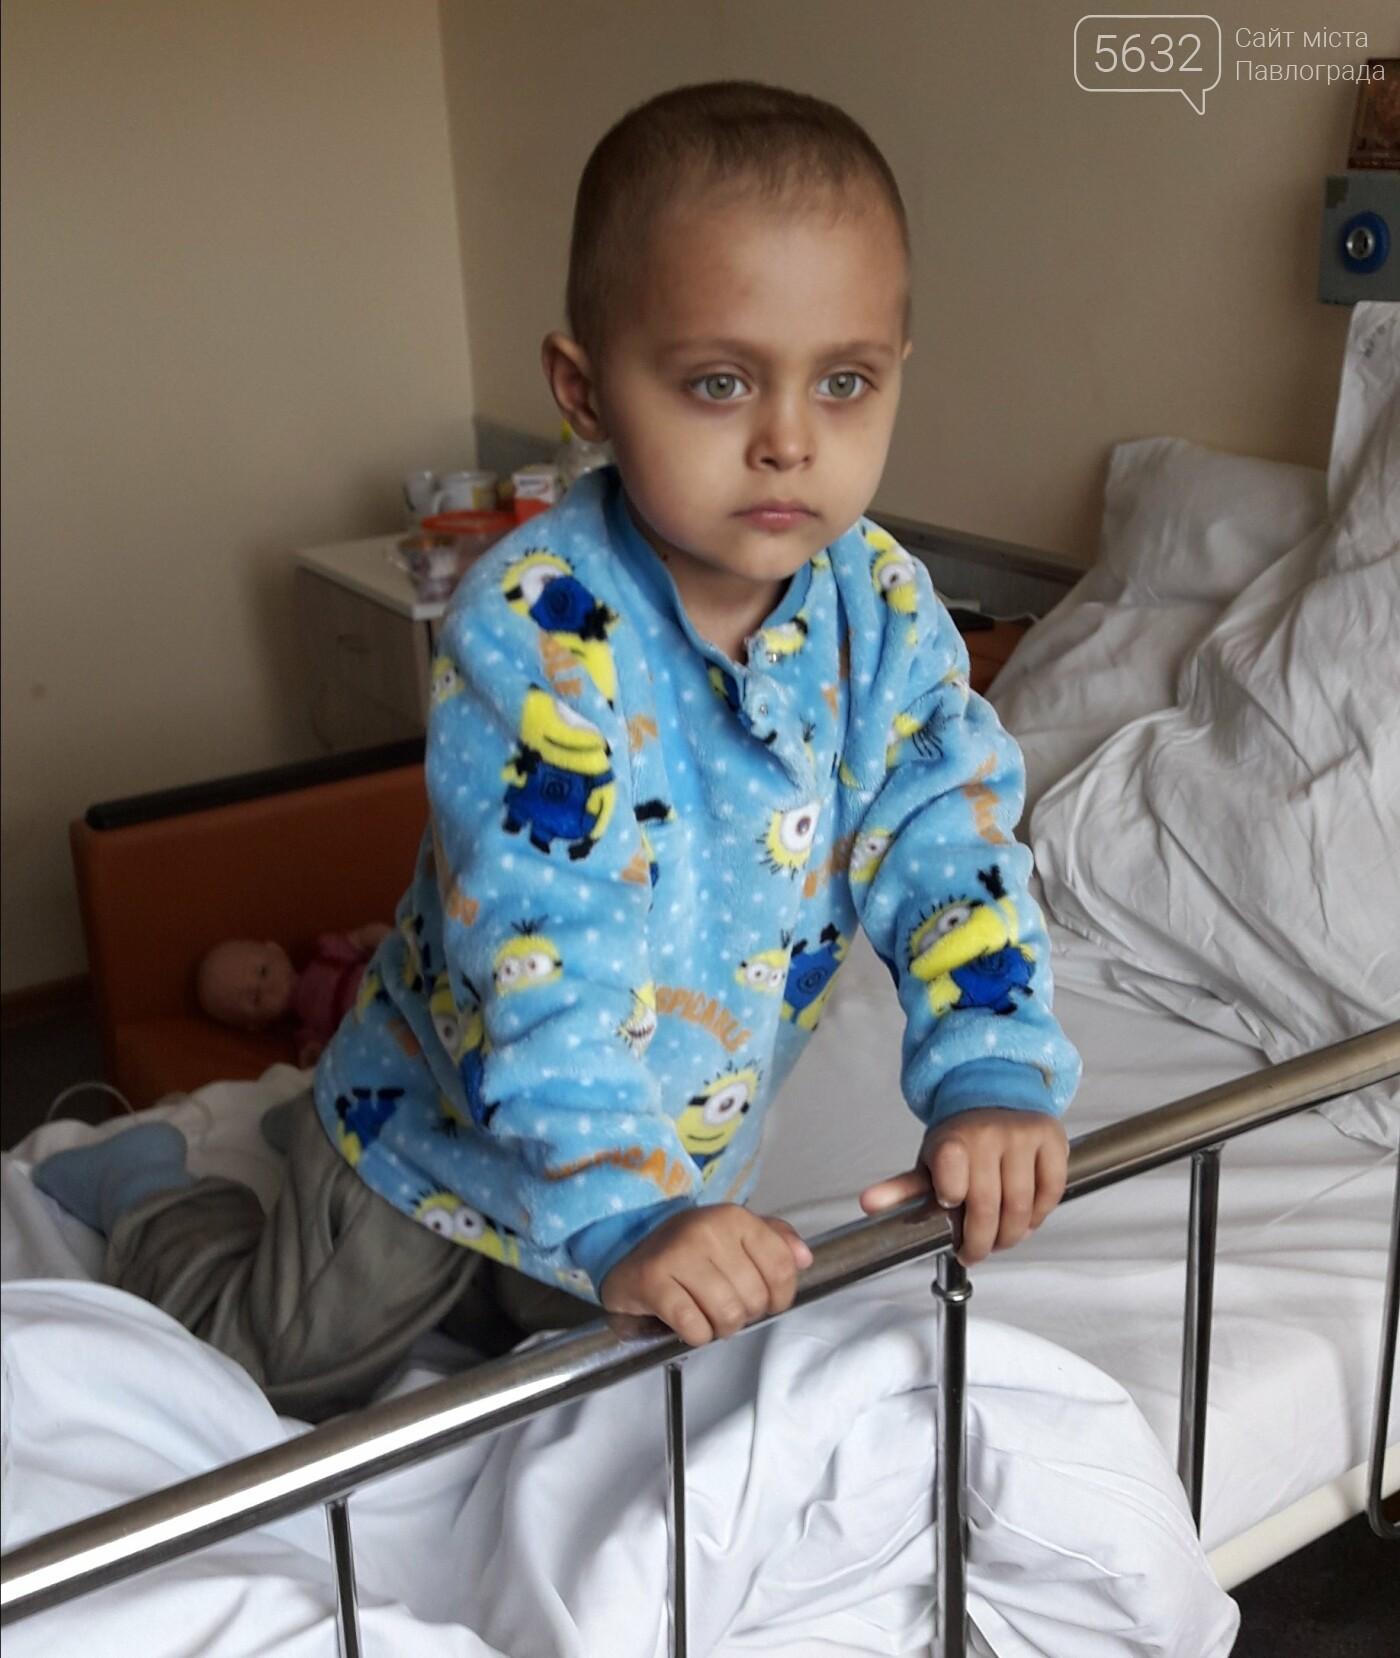 Трехлетнему павлоградцу Олегу срочно нужна ваша помощь, фото-2